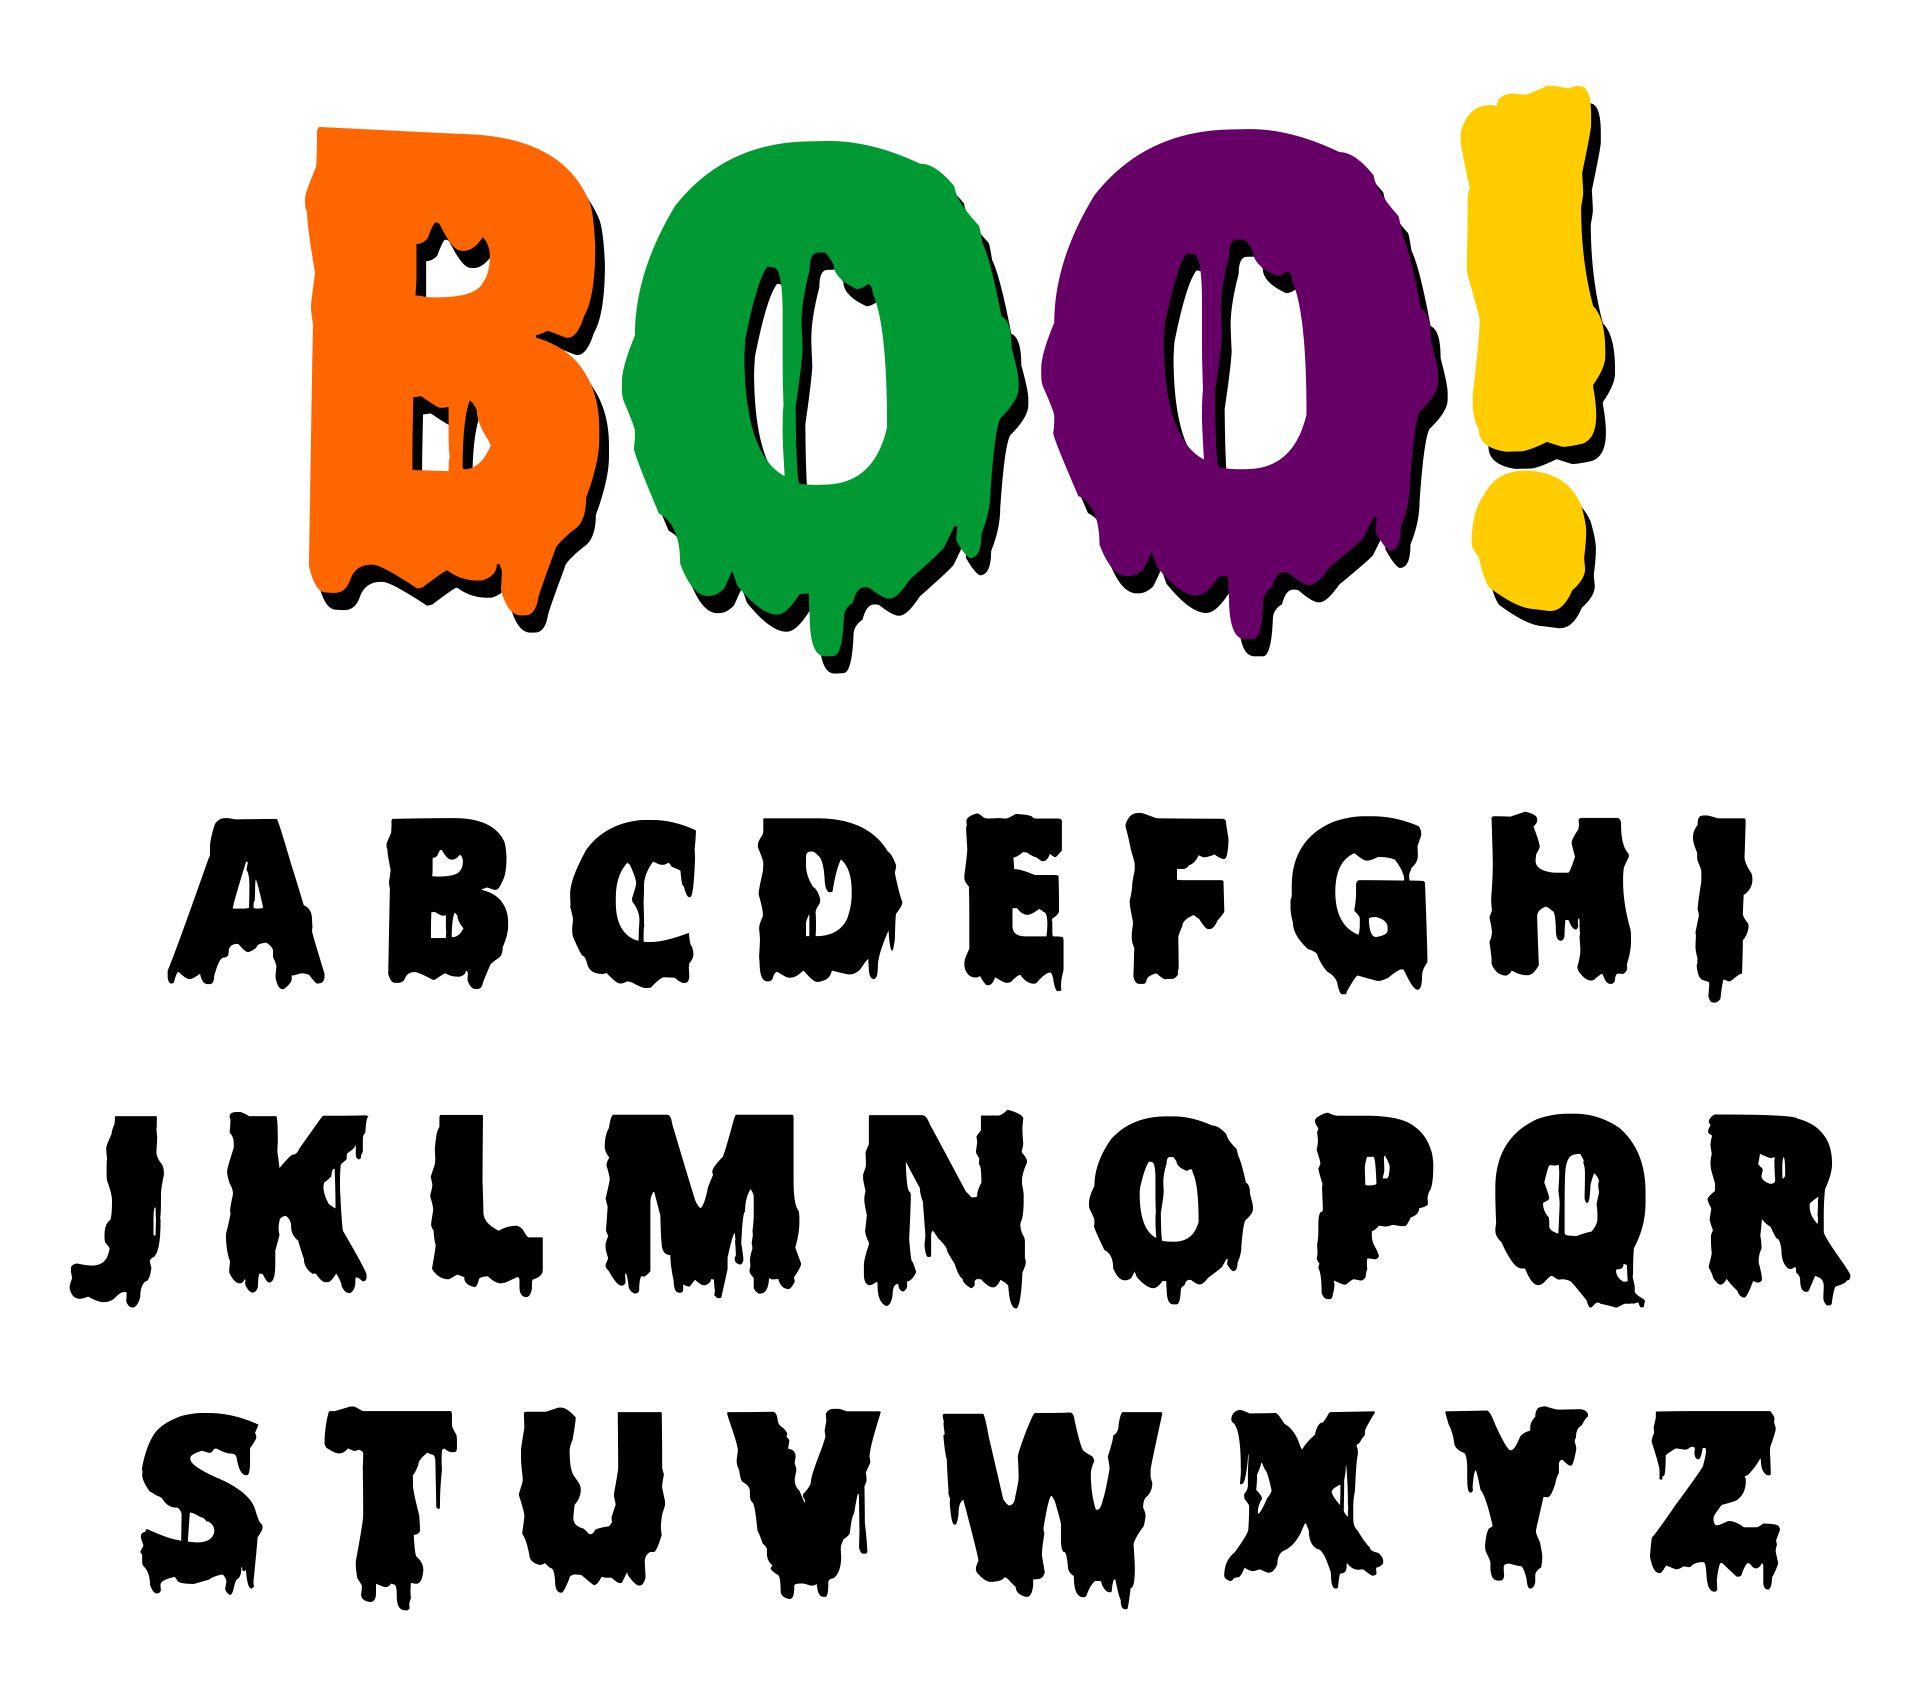 Printable Halloween Letters - Boo!